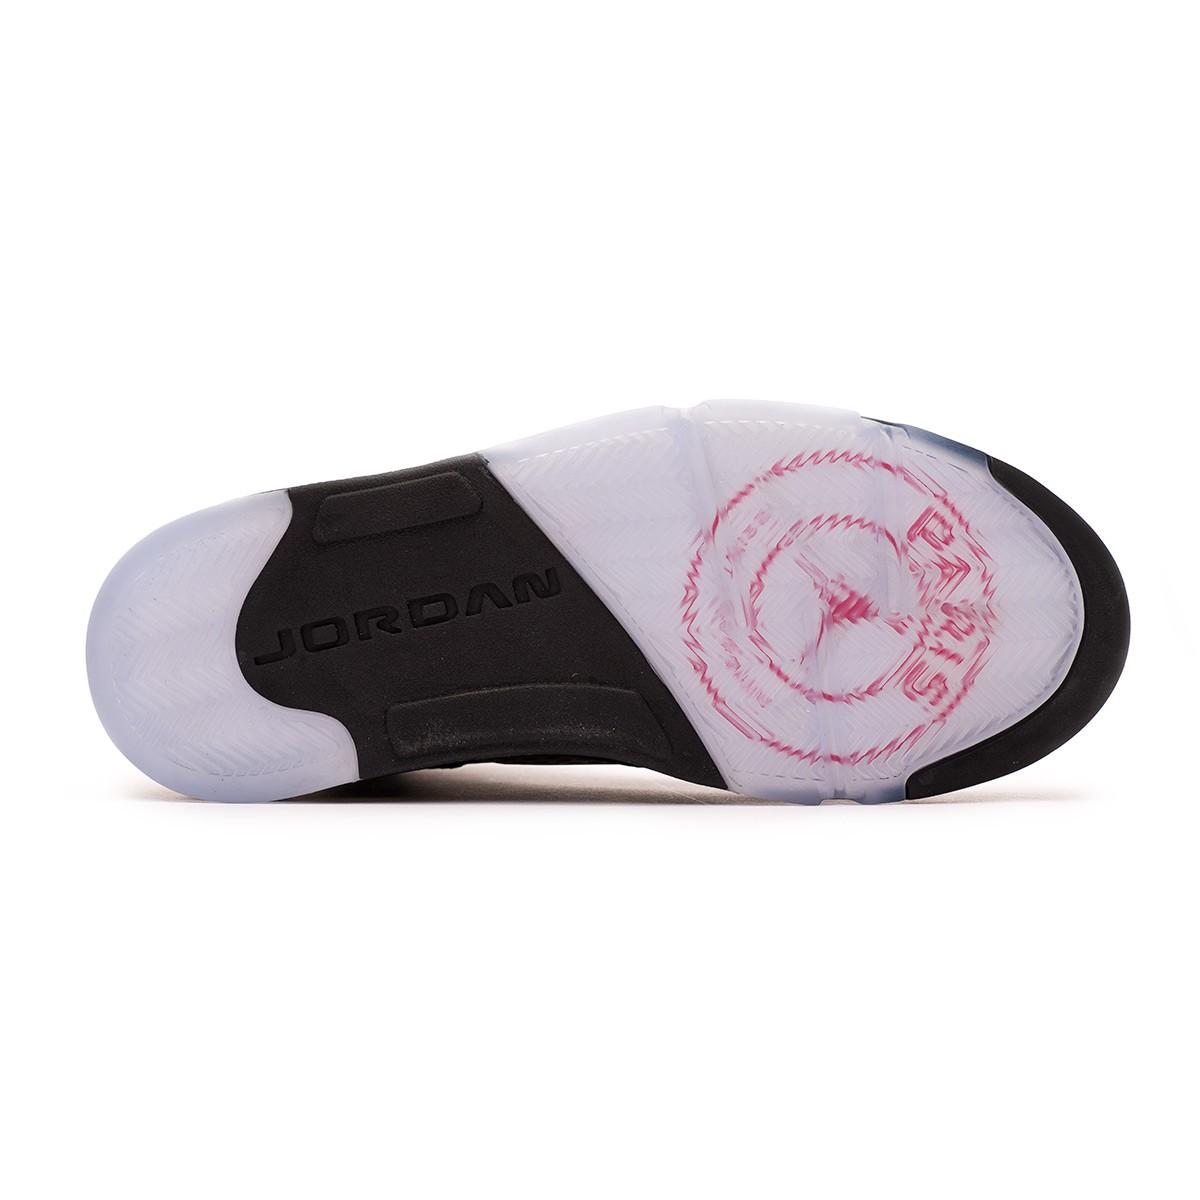 e04dd09bef0c Trainers Nike Air Jordan 5 Retro Jordan x PSG Black-Challenge red-White -  Football store Fútbol Emotion